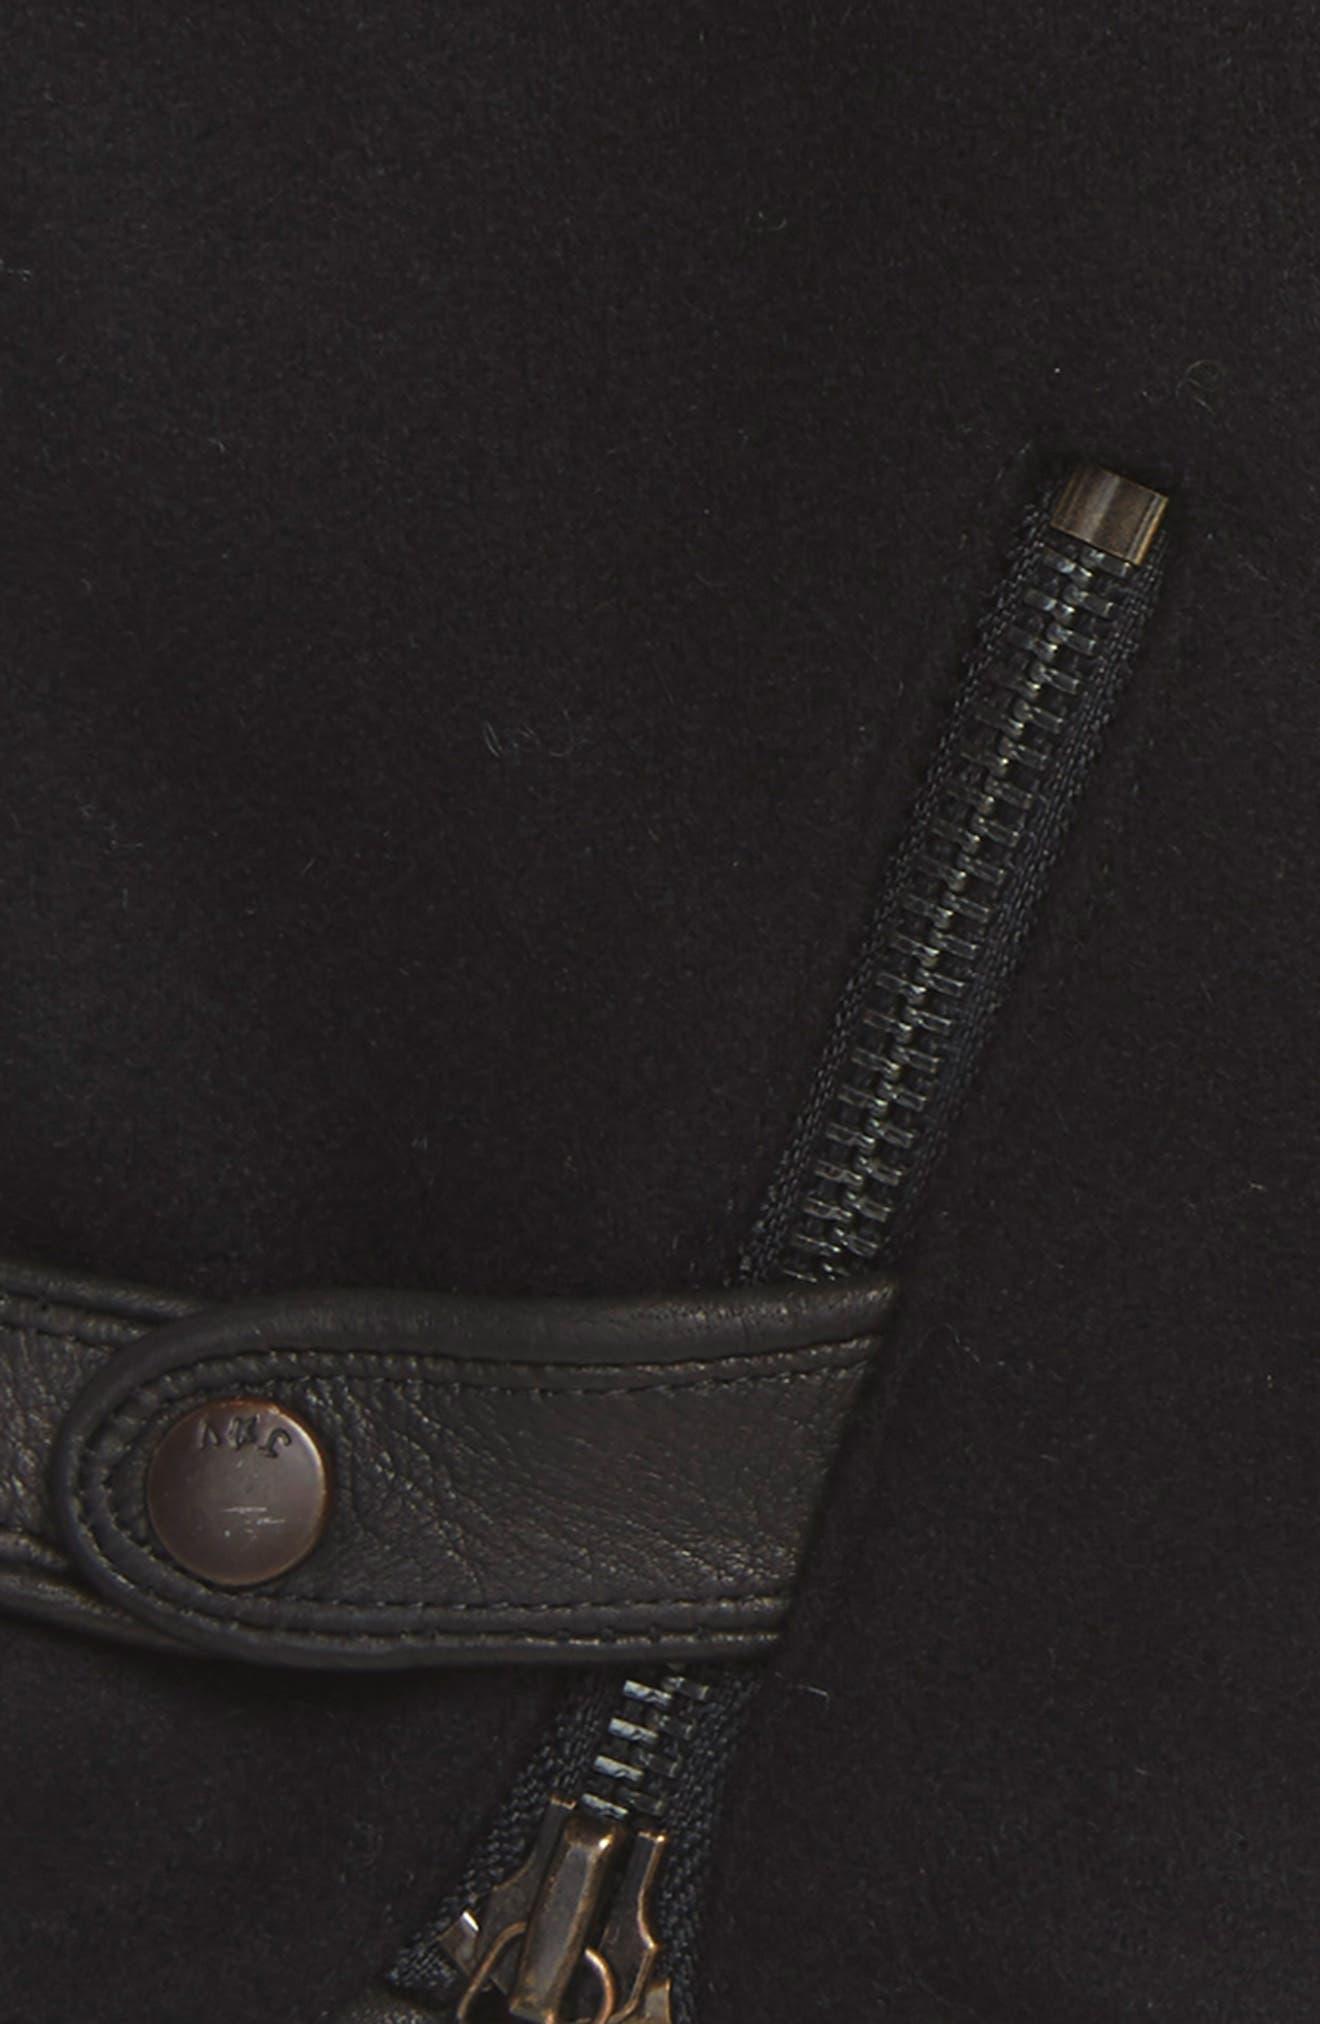 http://n.nordstrommedia.com/imagegallery/store/product/Zoom/2/_100176534.jpg